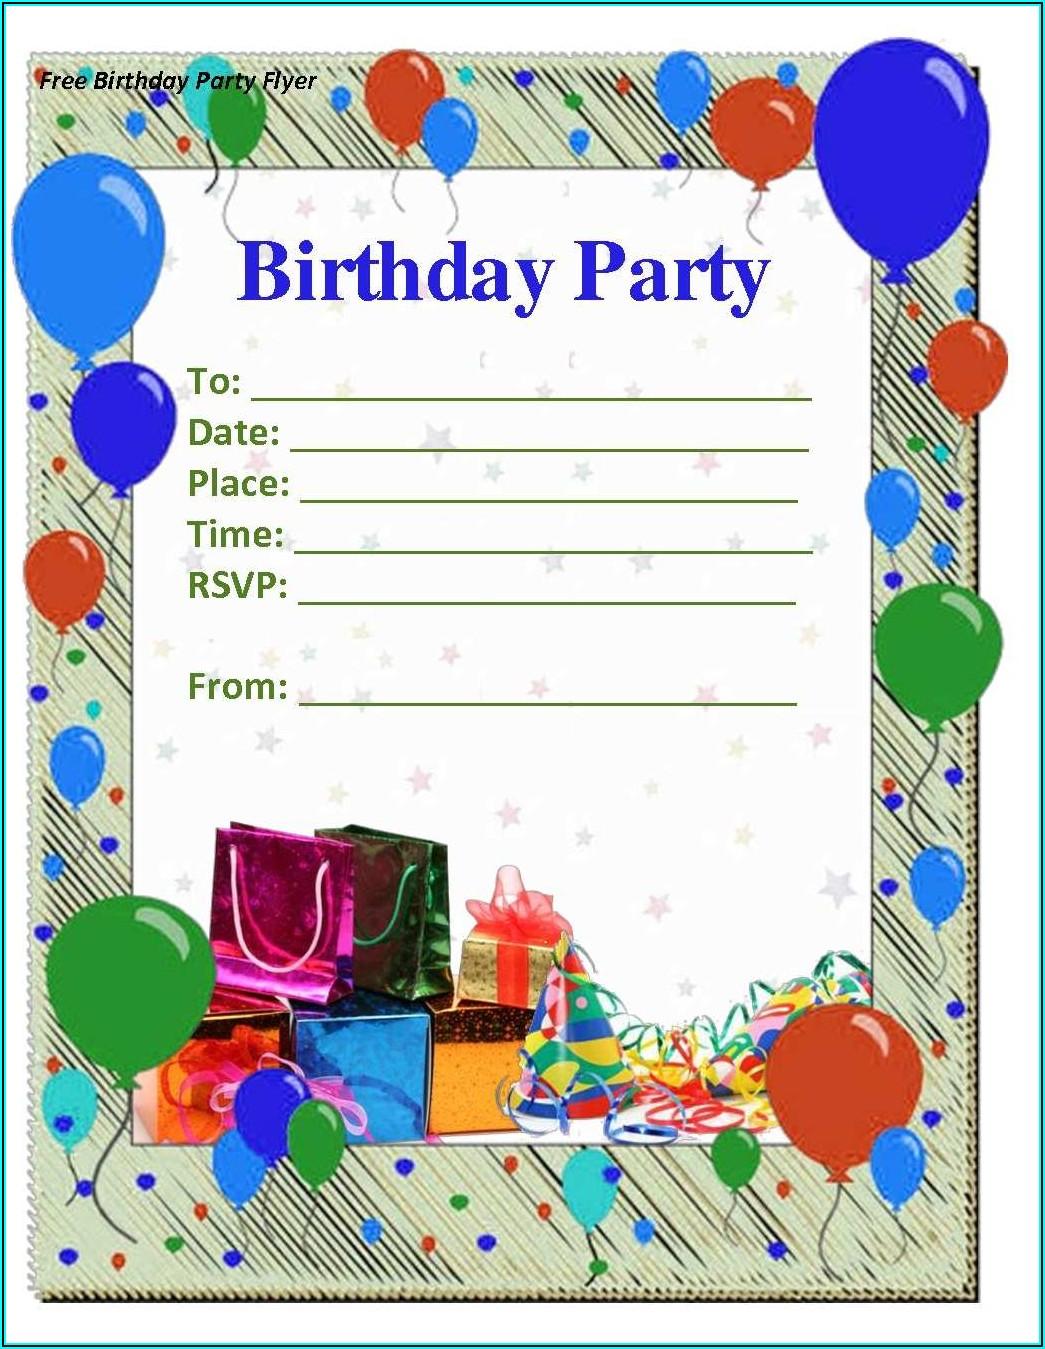 Blank Birthday Invitation Card Template Free Download